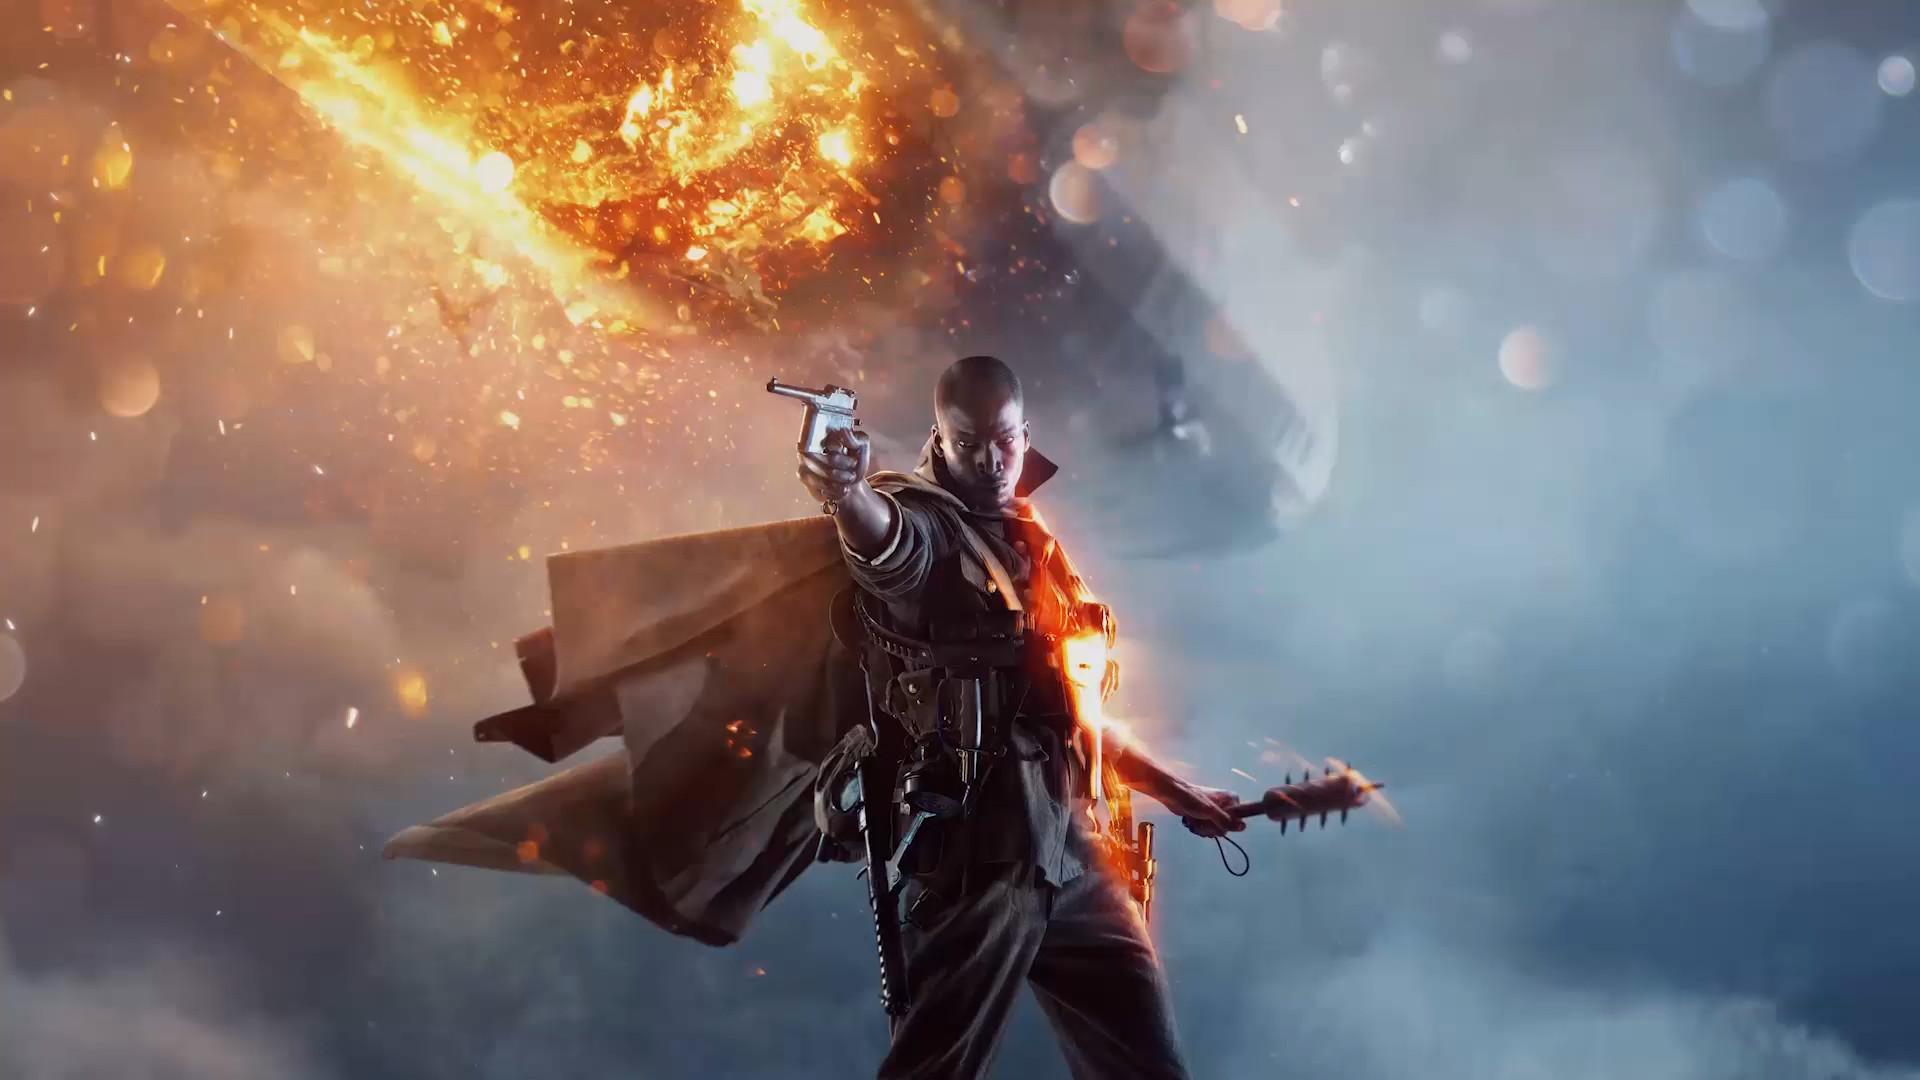 Battlefield-1-Images.jpg